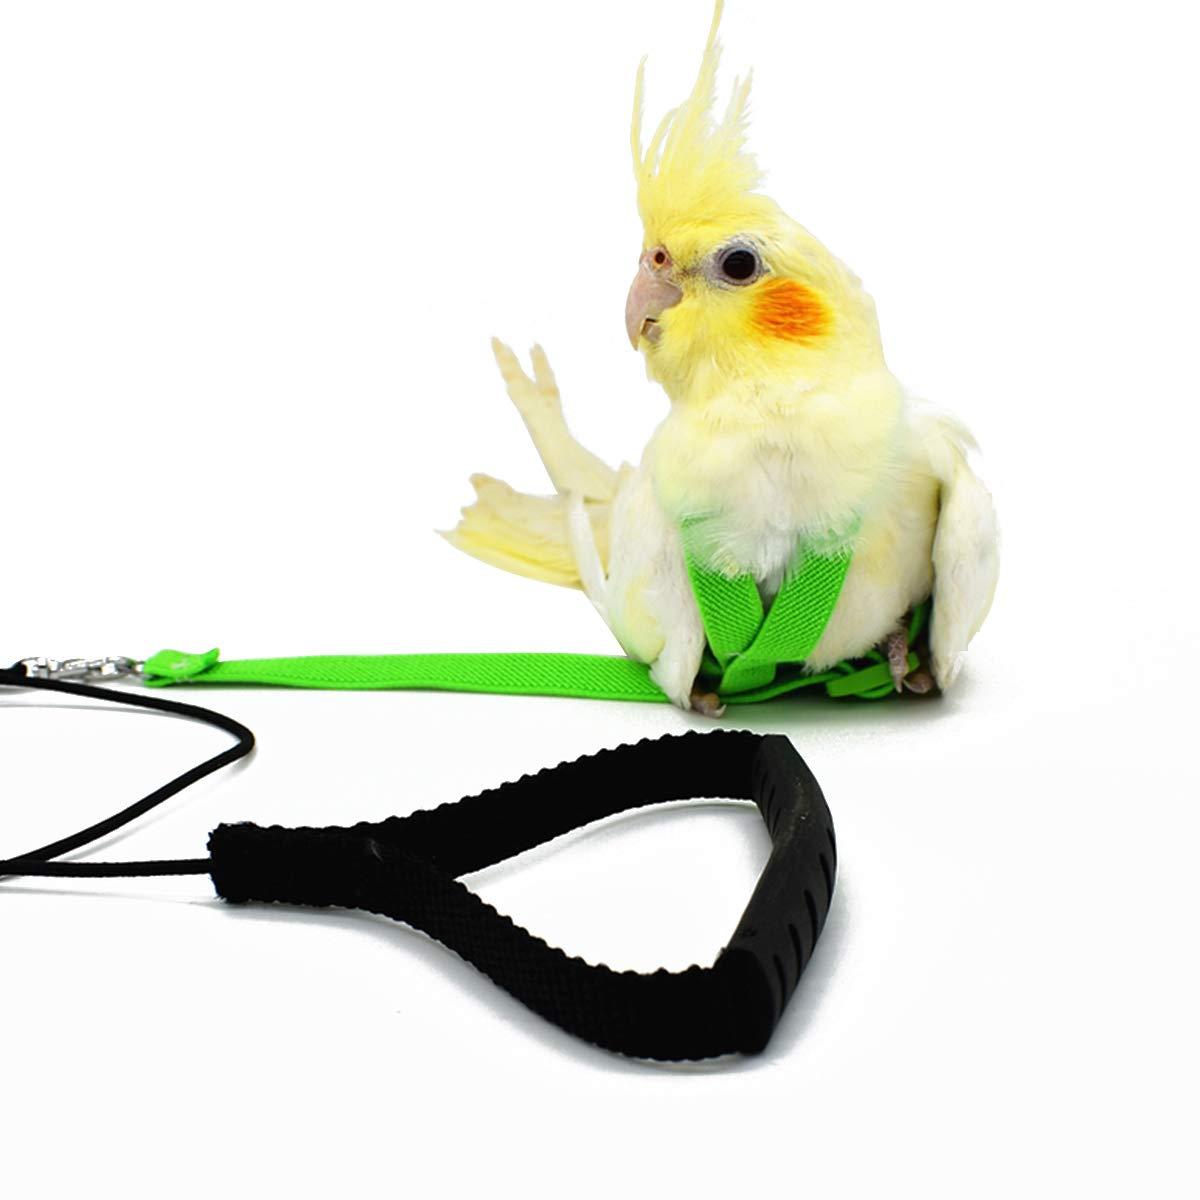 Adjustable Harness Leash for Parrot African Grey Cockatoo Macaw Ringneck Parakeet Cockatiel and Reptile Lizard Outdoor…